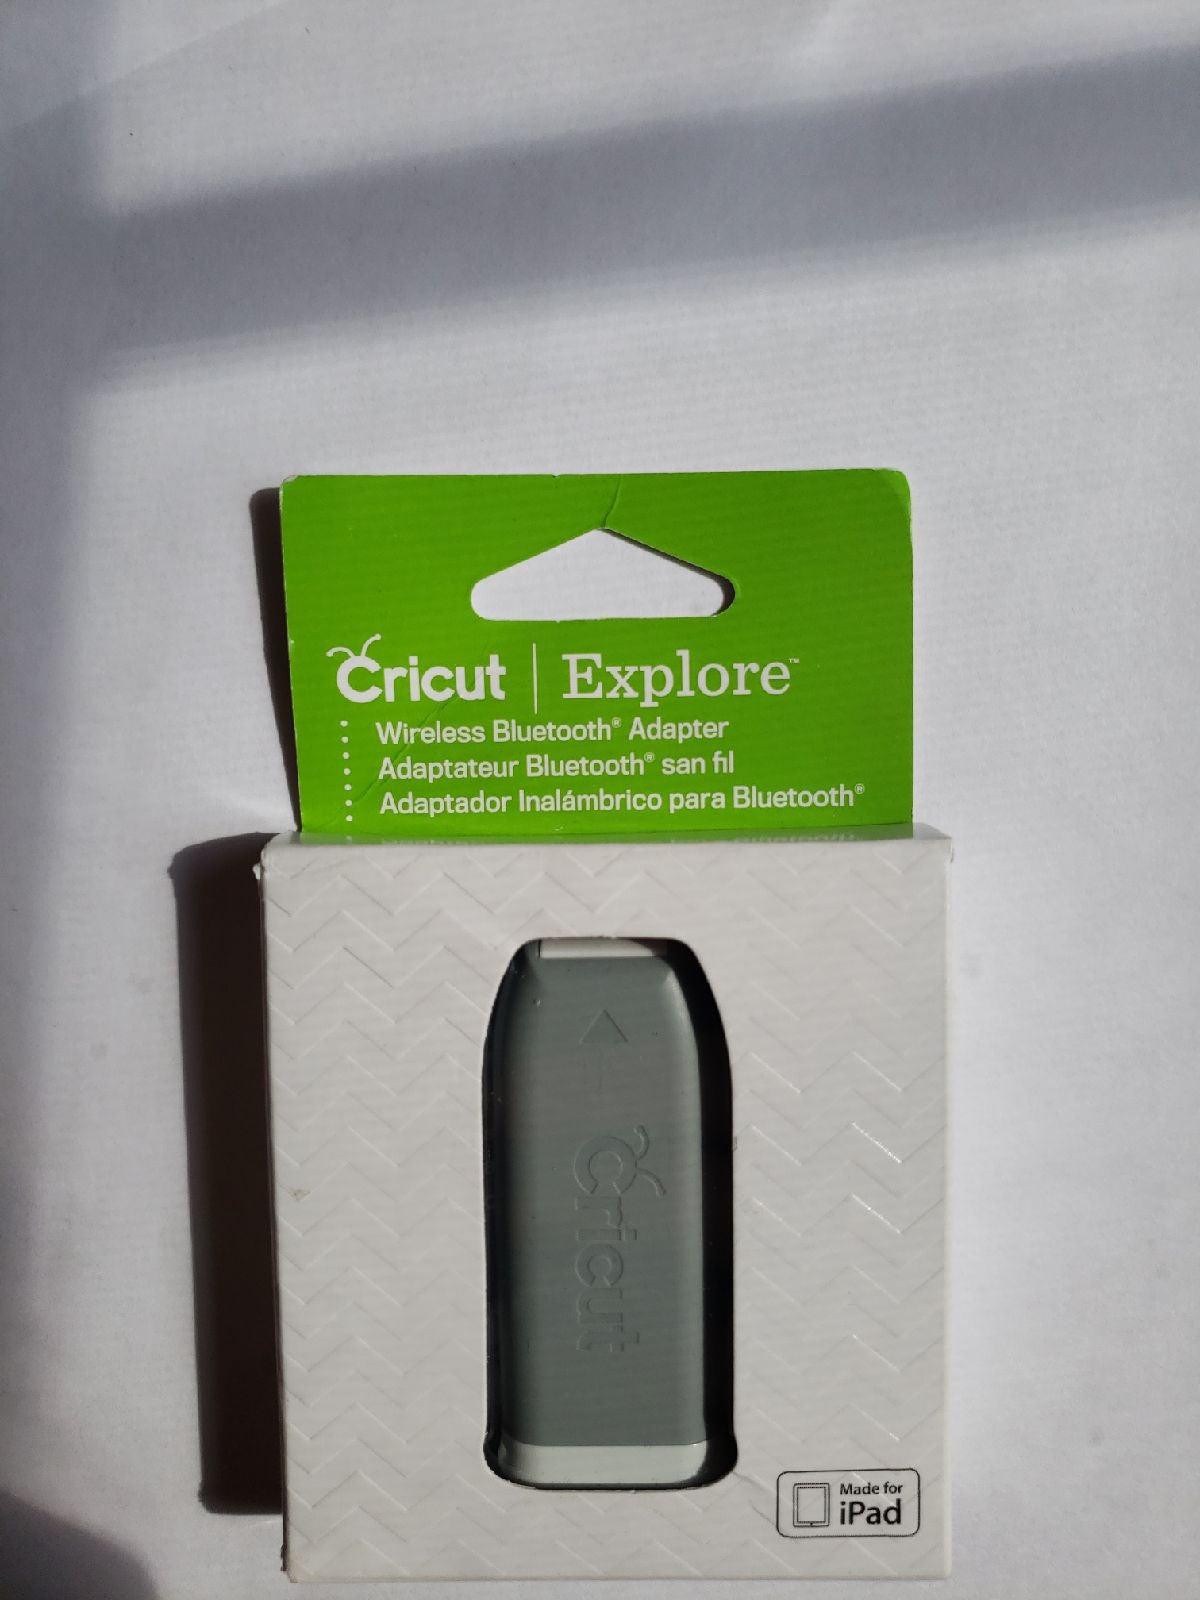 Cricut Explore Bluetooth Adapter